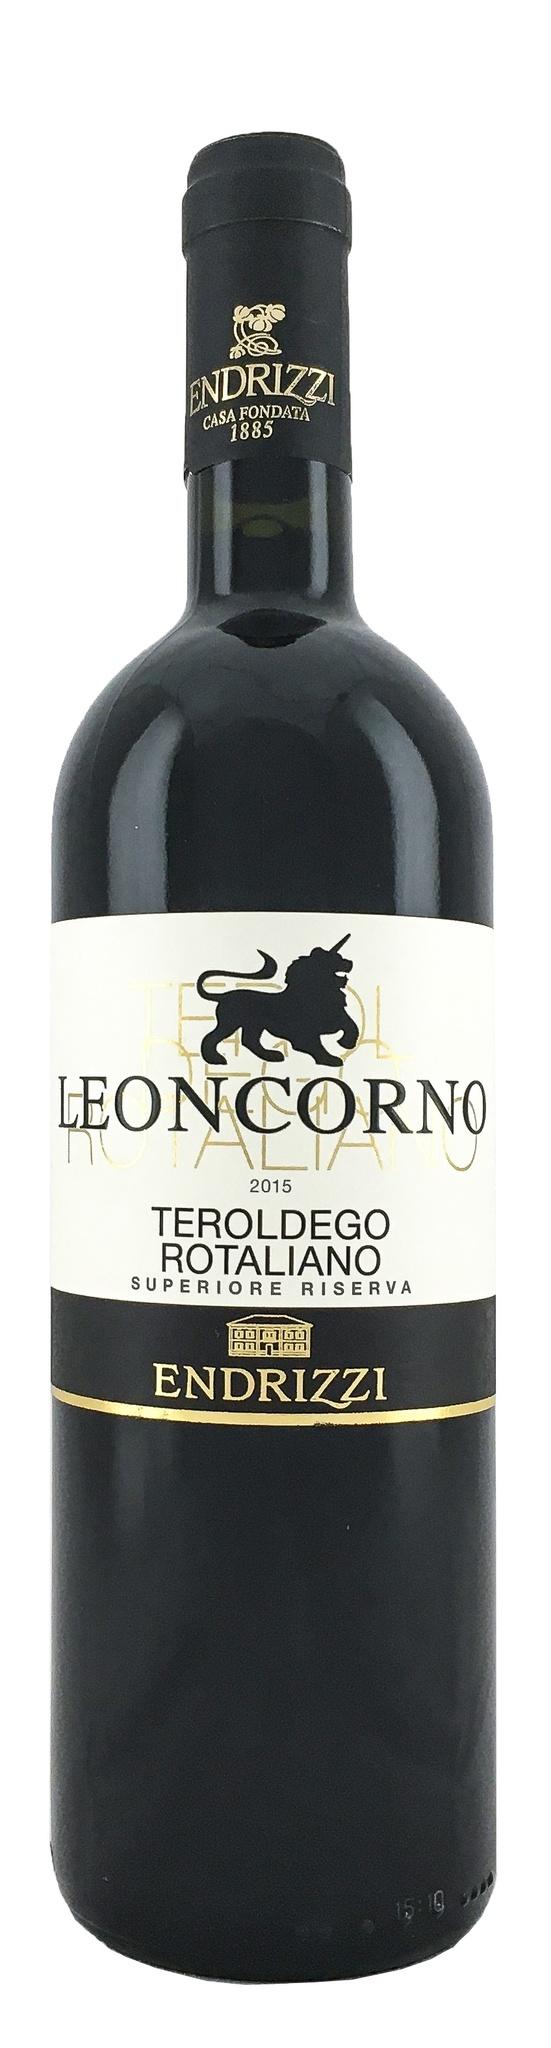 Вино Леонкорно Терольдего Роталиано Супериоре Ризерва сухое красное з.н.м.п рег.Трентино 0,75л.